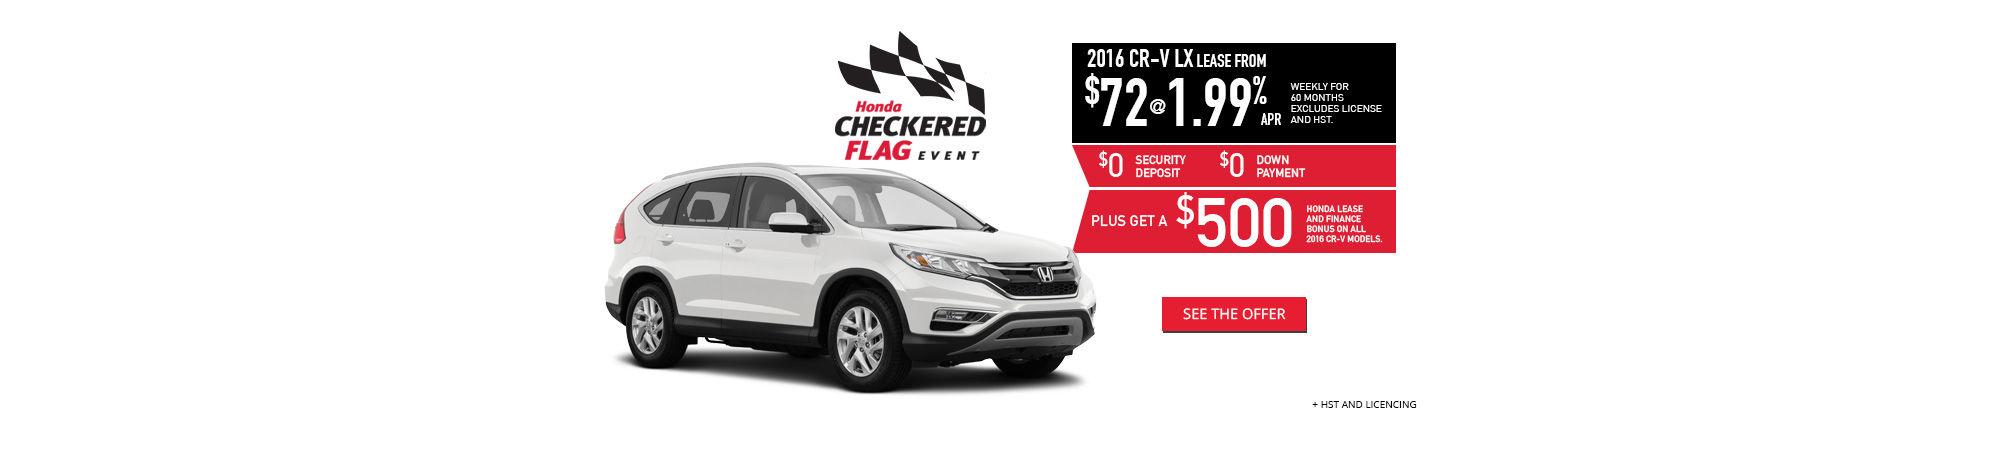 Checkered Flag June Promo CRV